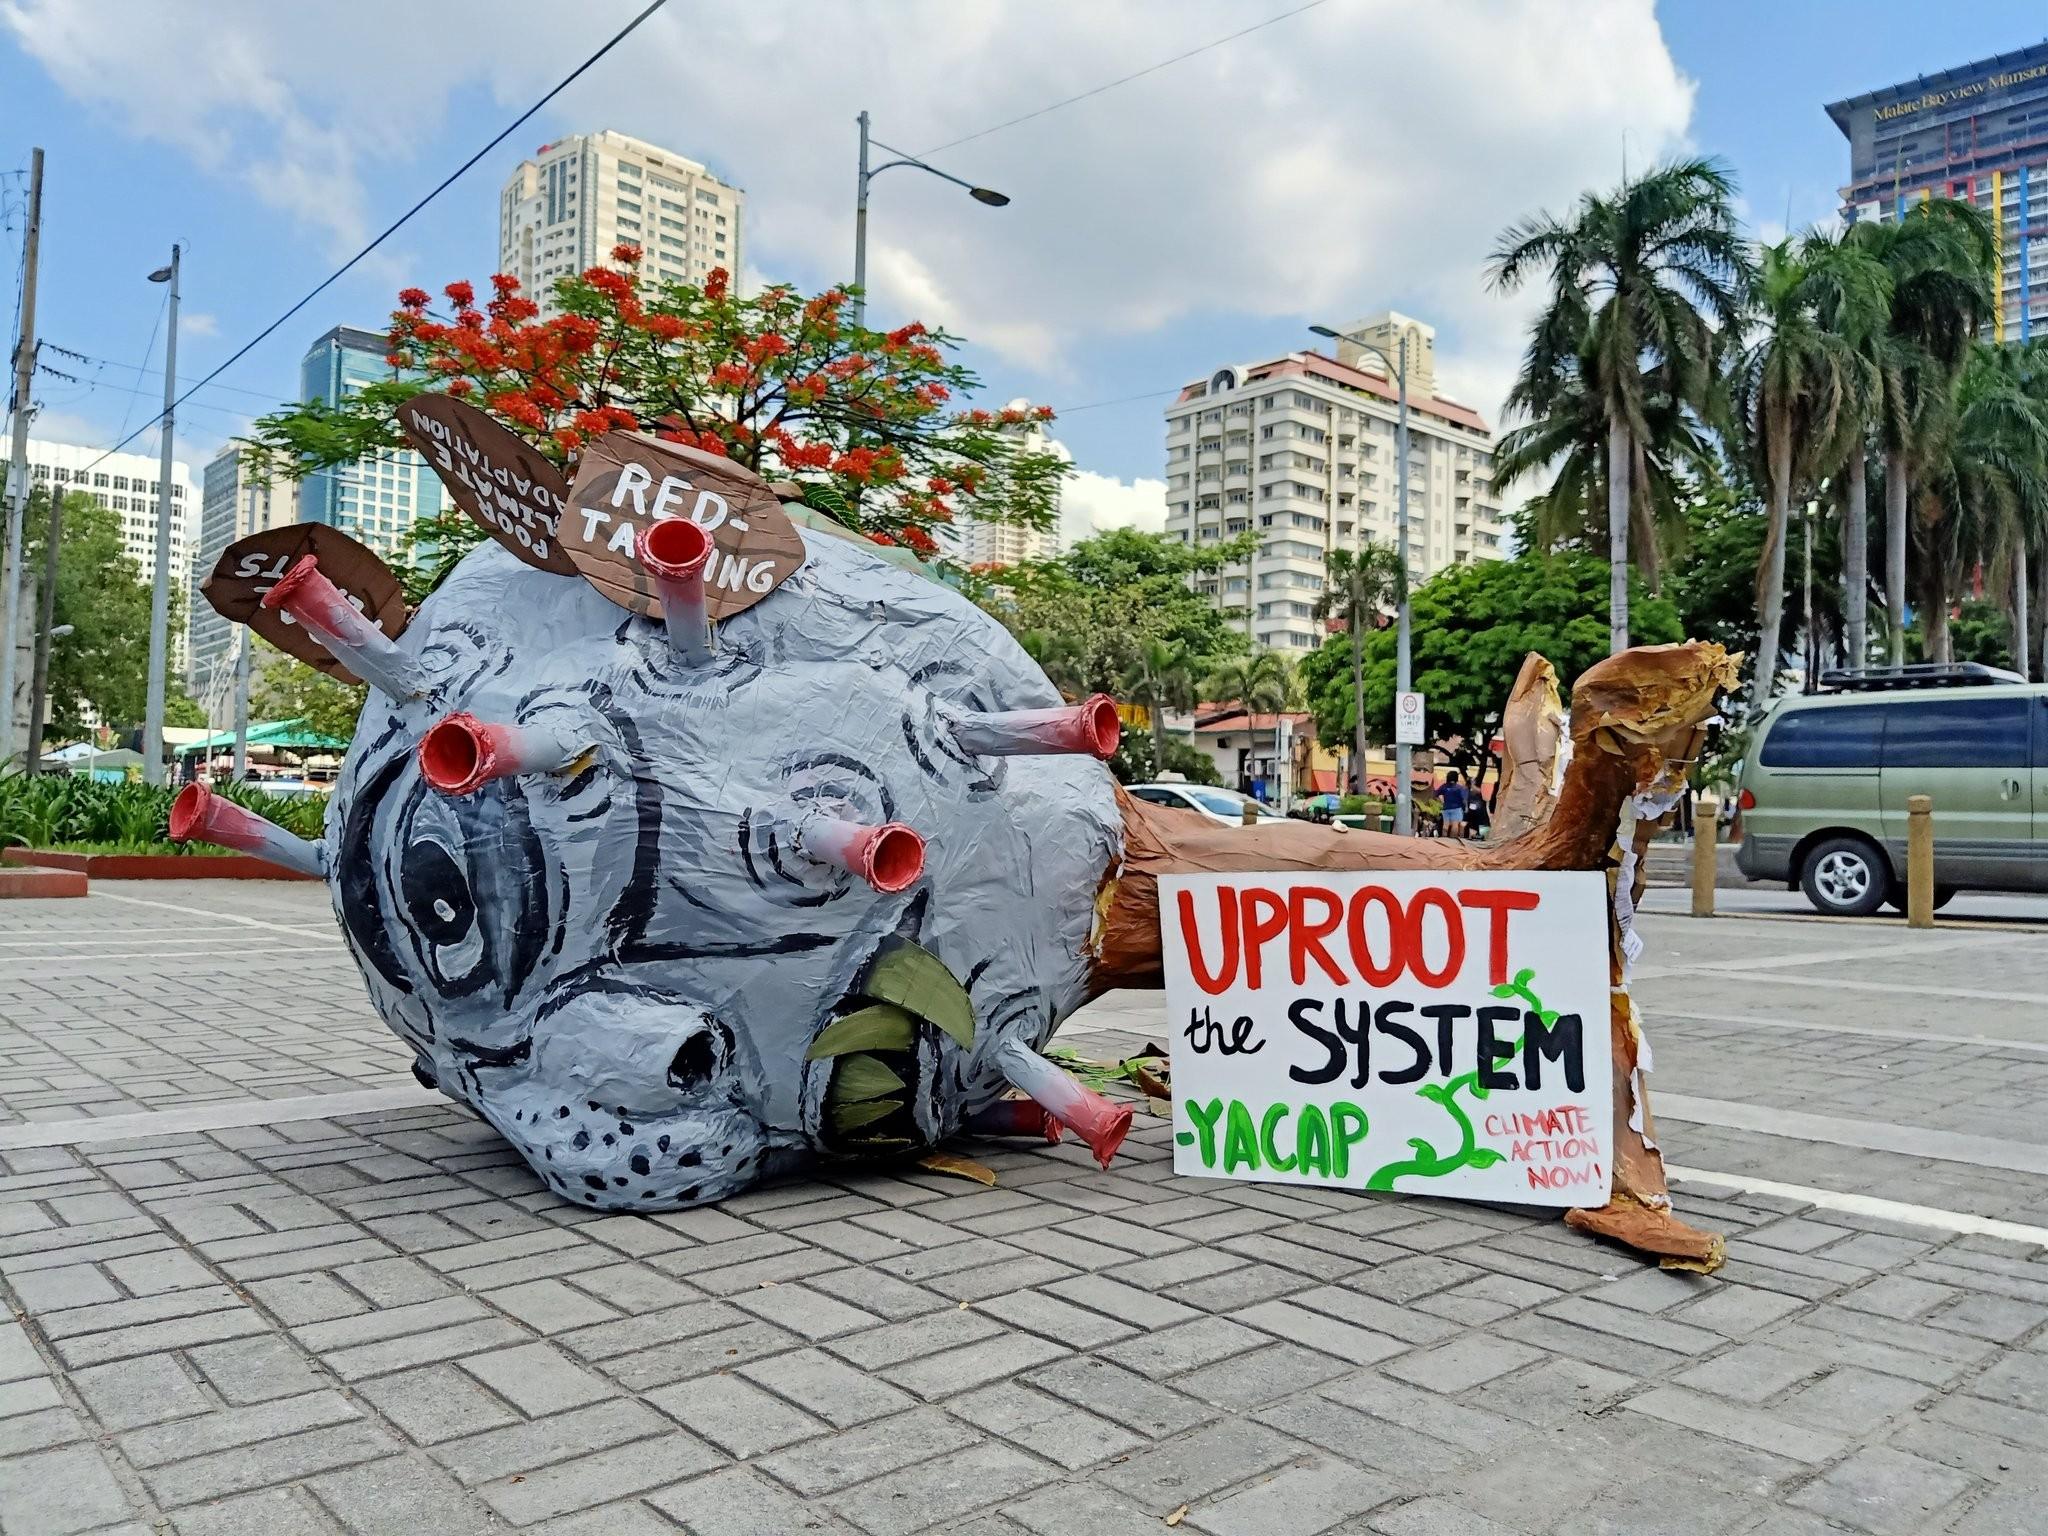 Huelga por el clima en Manila, Filipinas - Foto FFFMAPA/Twitter